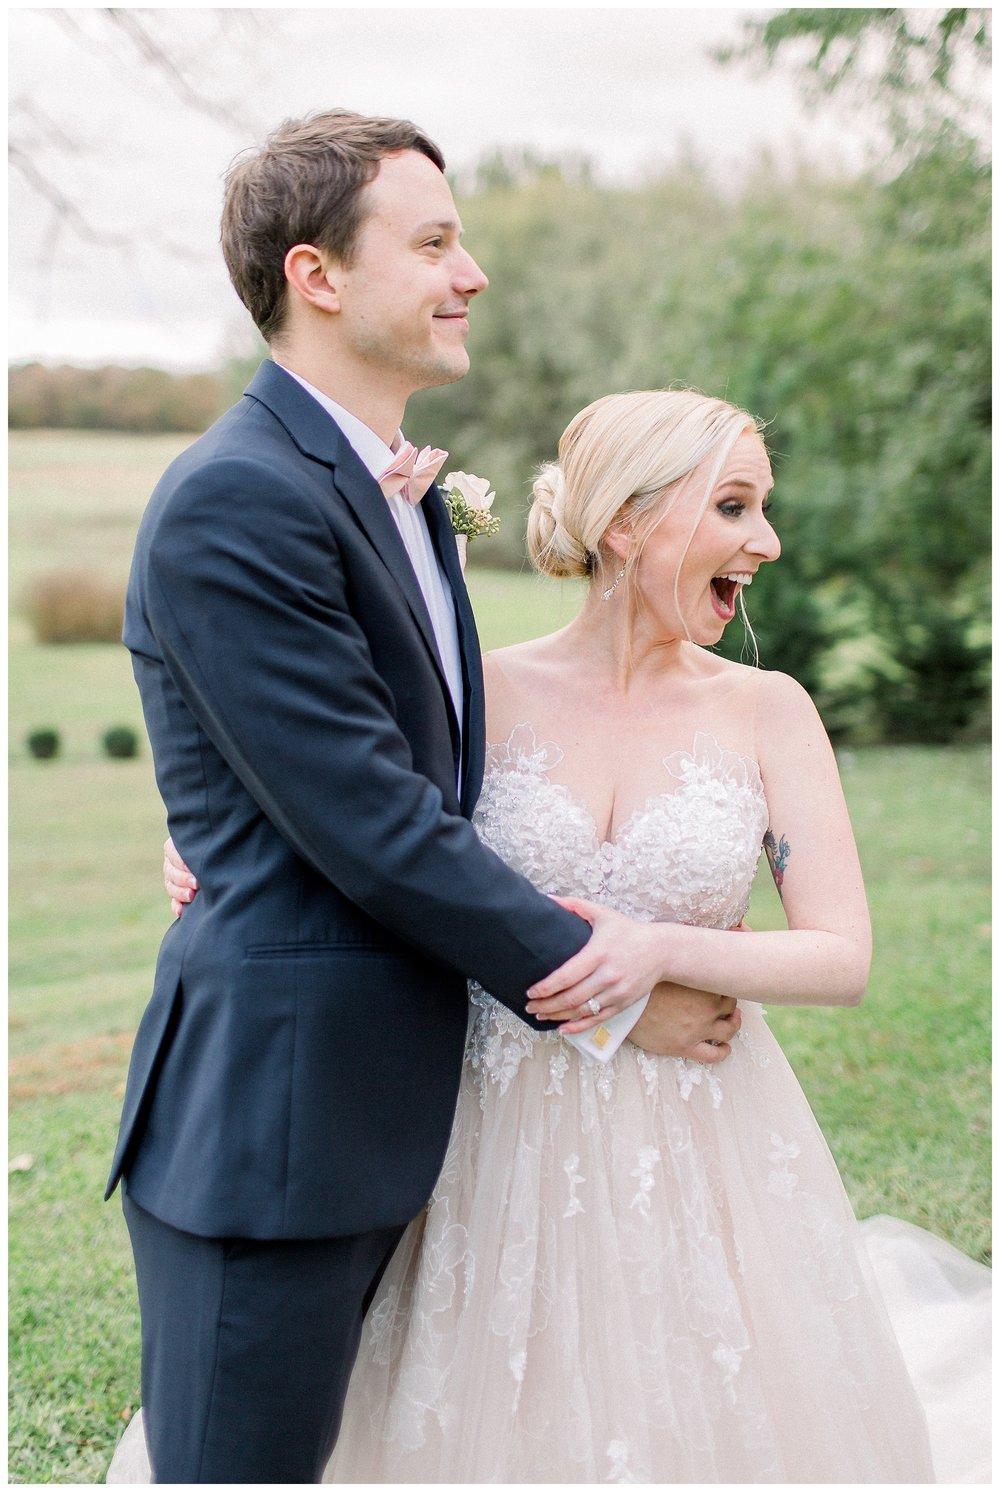 Whitehall Estate Wedding | Northern Virginia Wedding Photographer Kir Tuben_0083.jpg